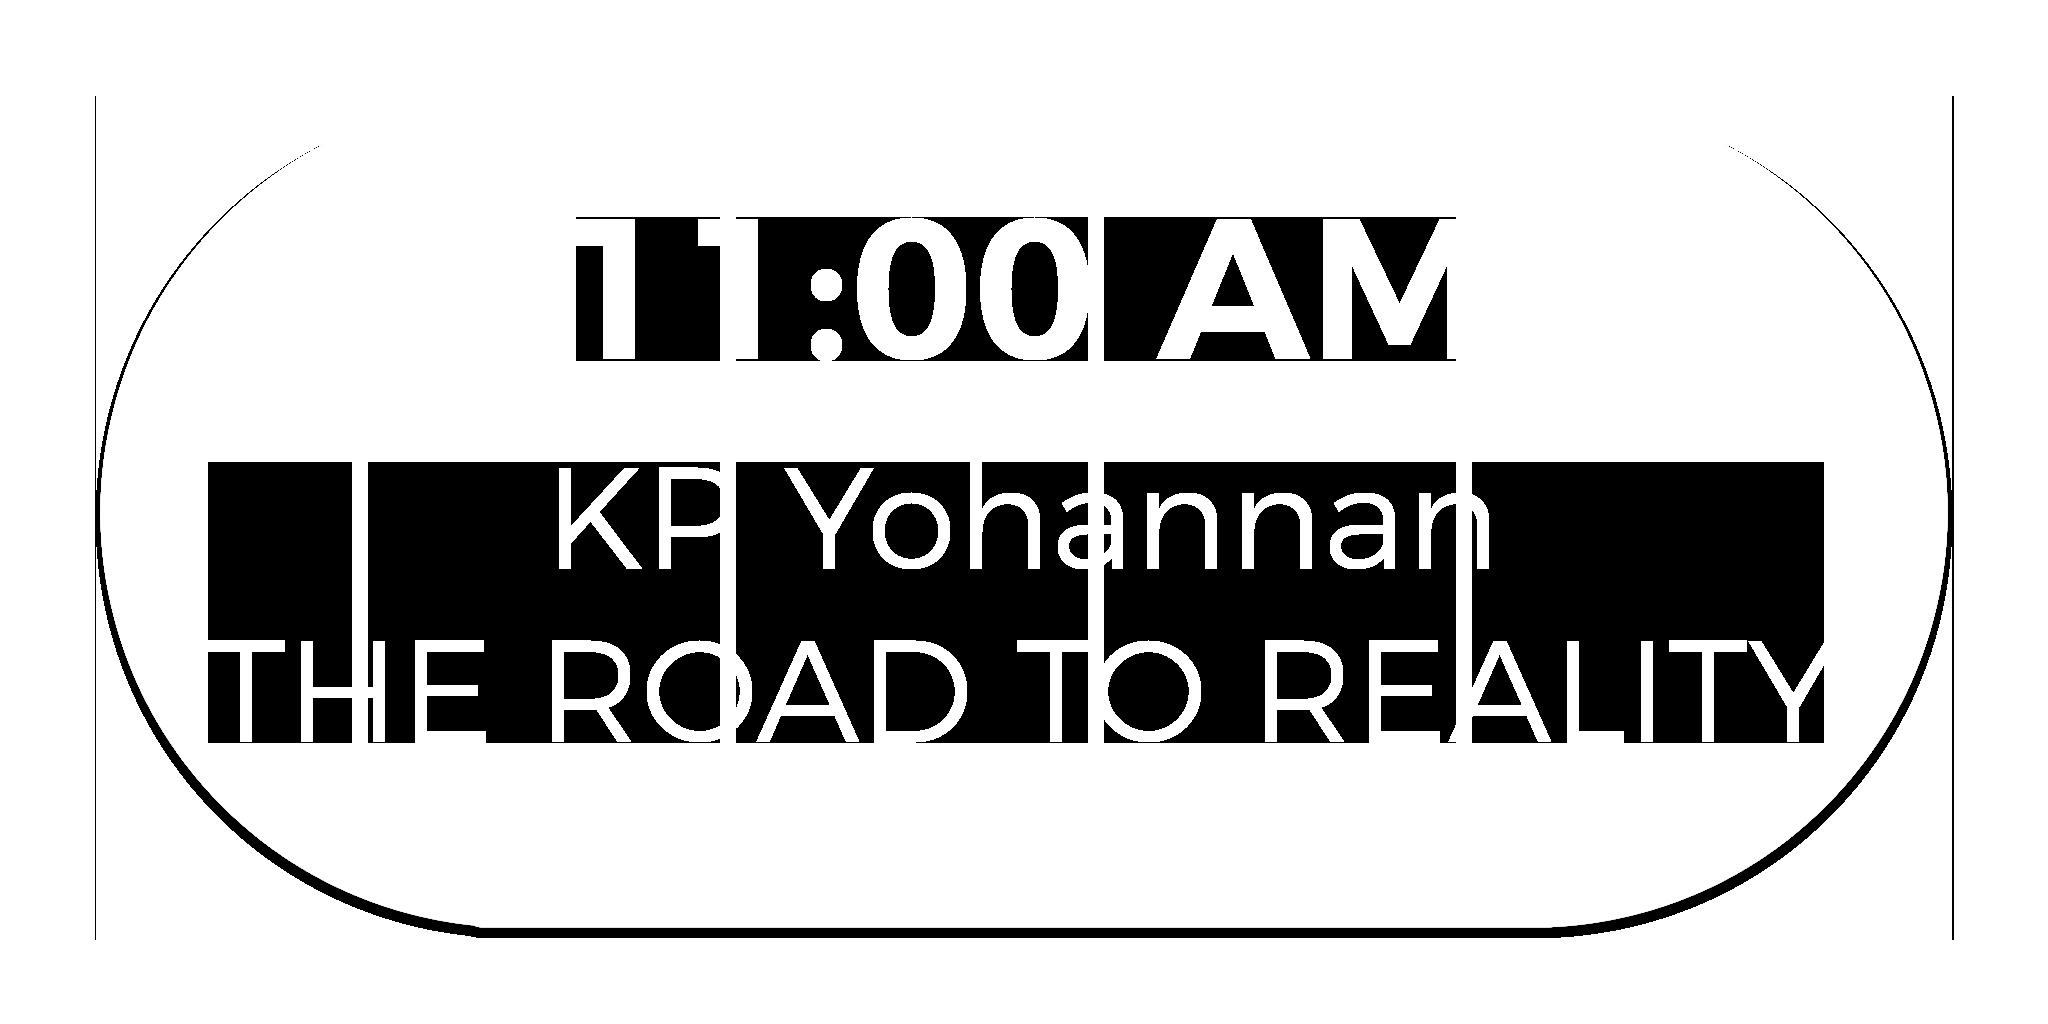 1100 kp yohannan.png